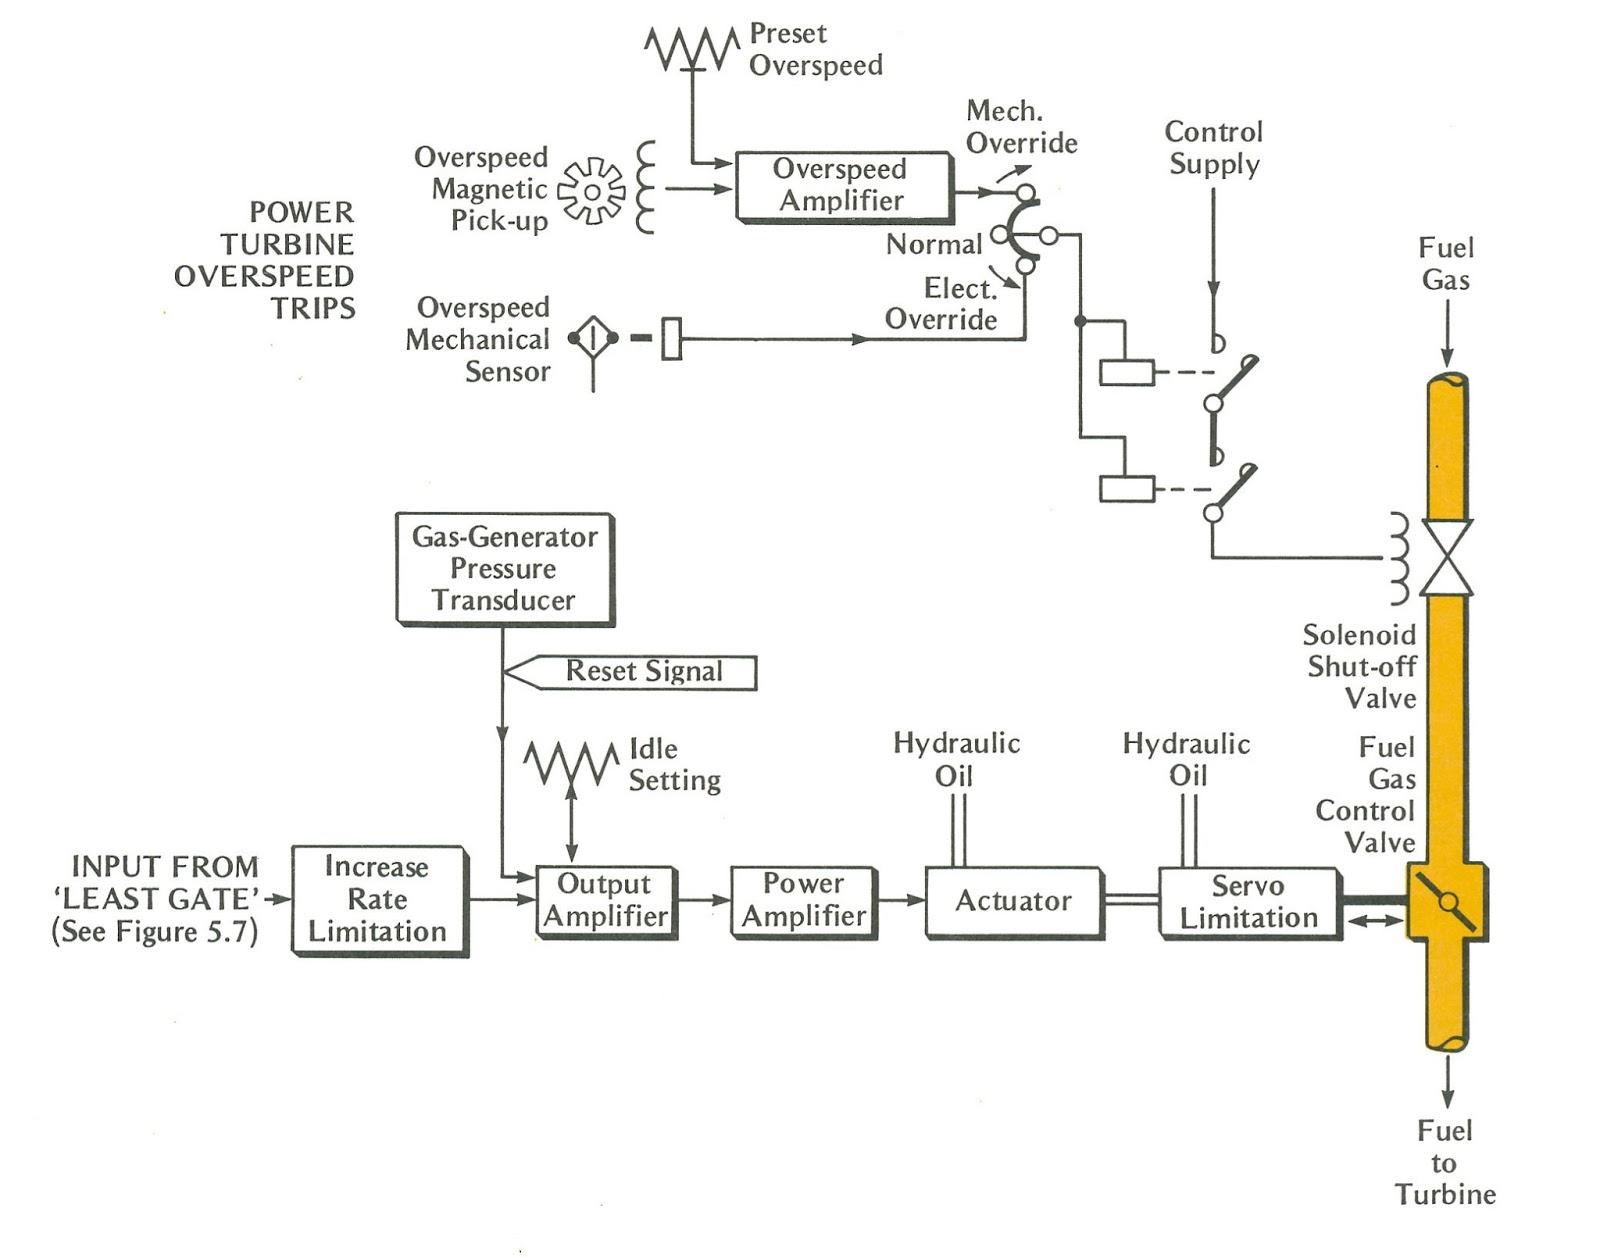 wiring diagram for steam iron wiring diagram wiring diagram for steam iron [ 1600 x 1258 Pixel ]